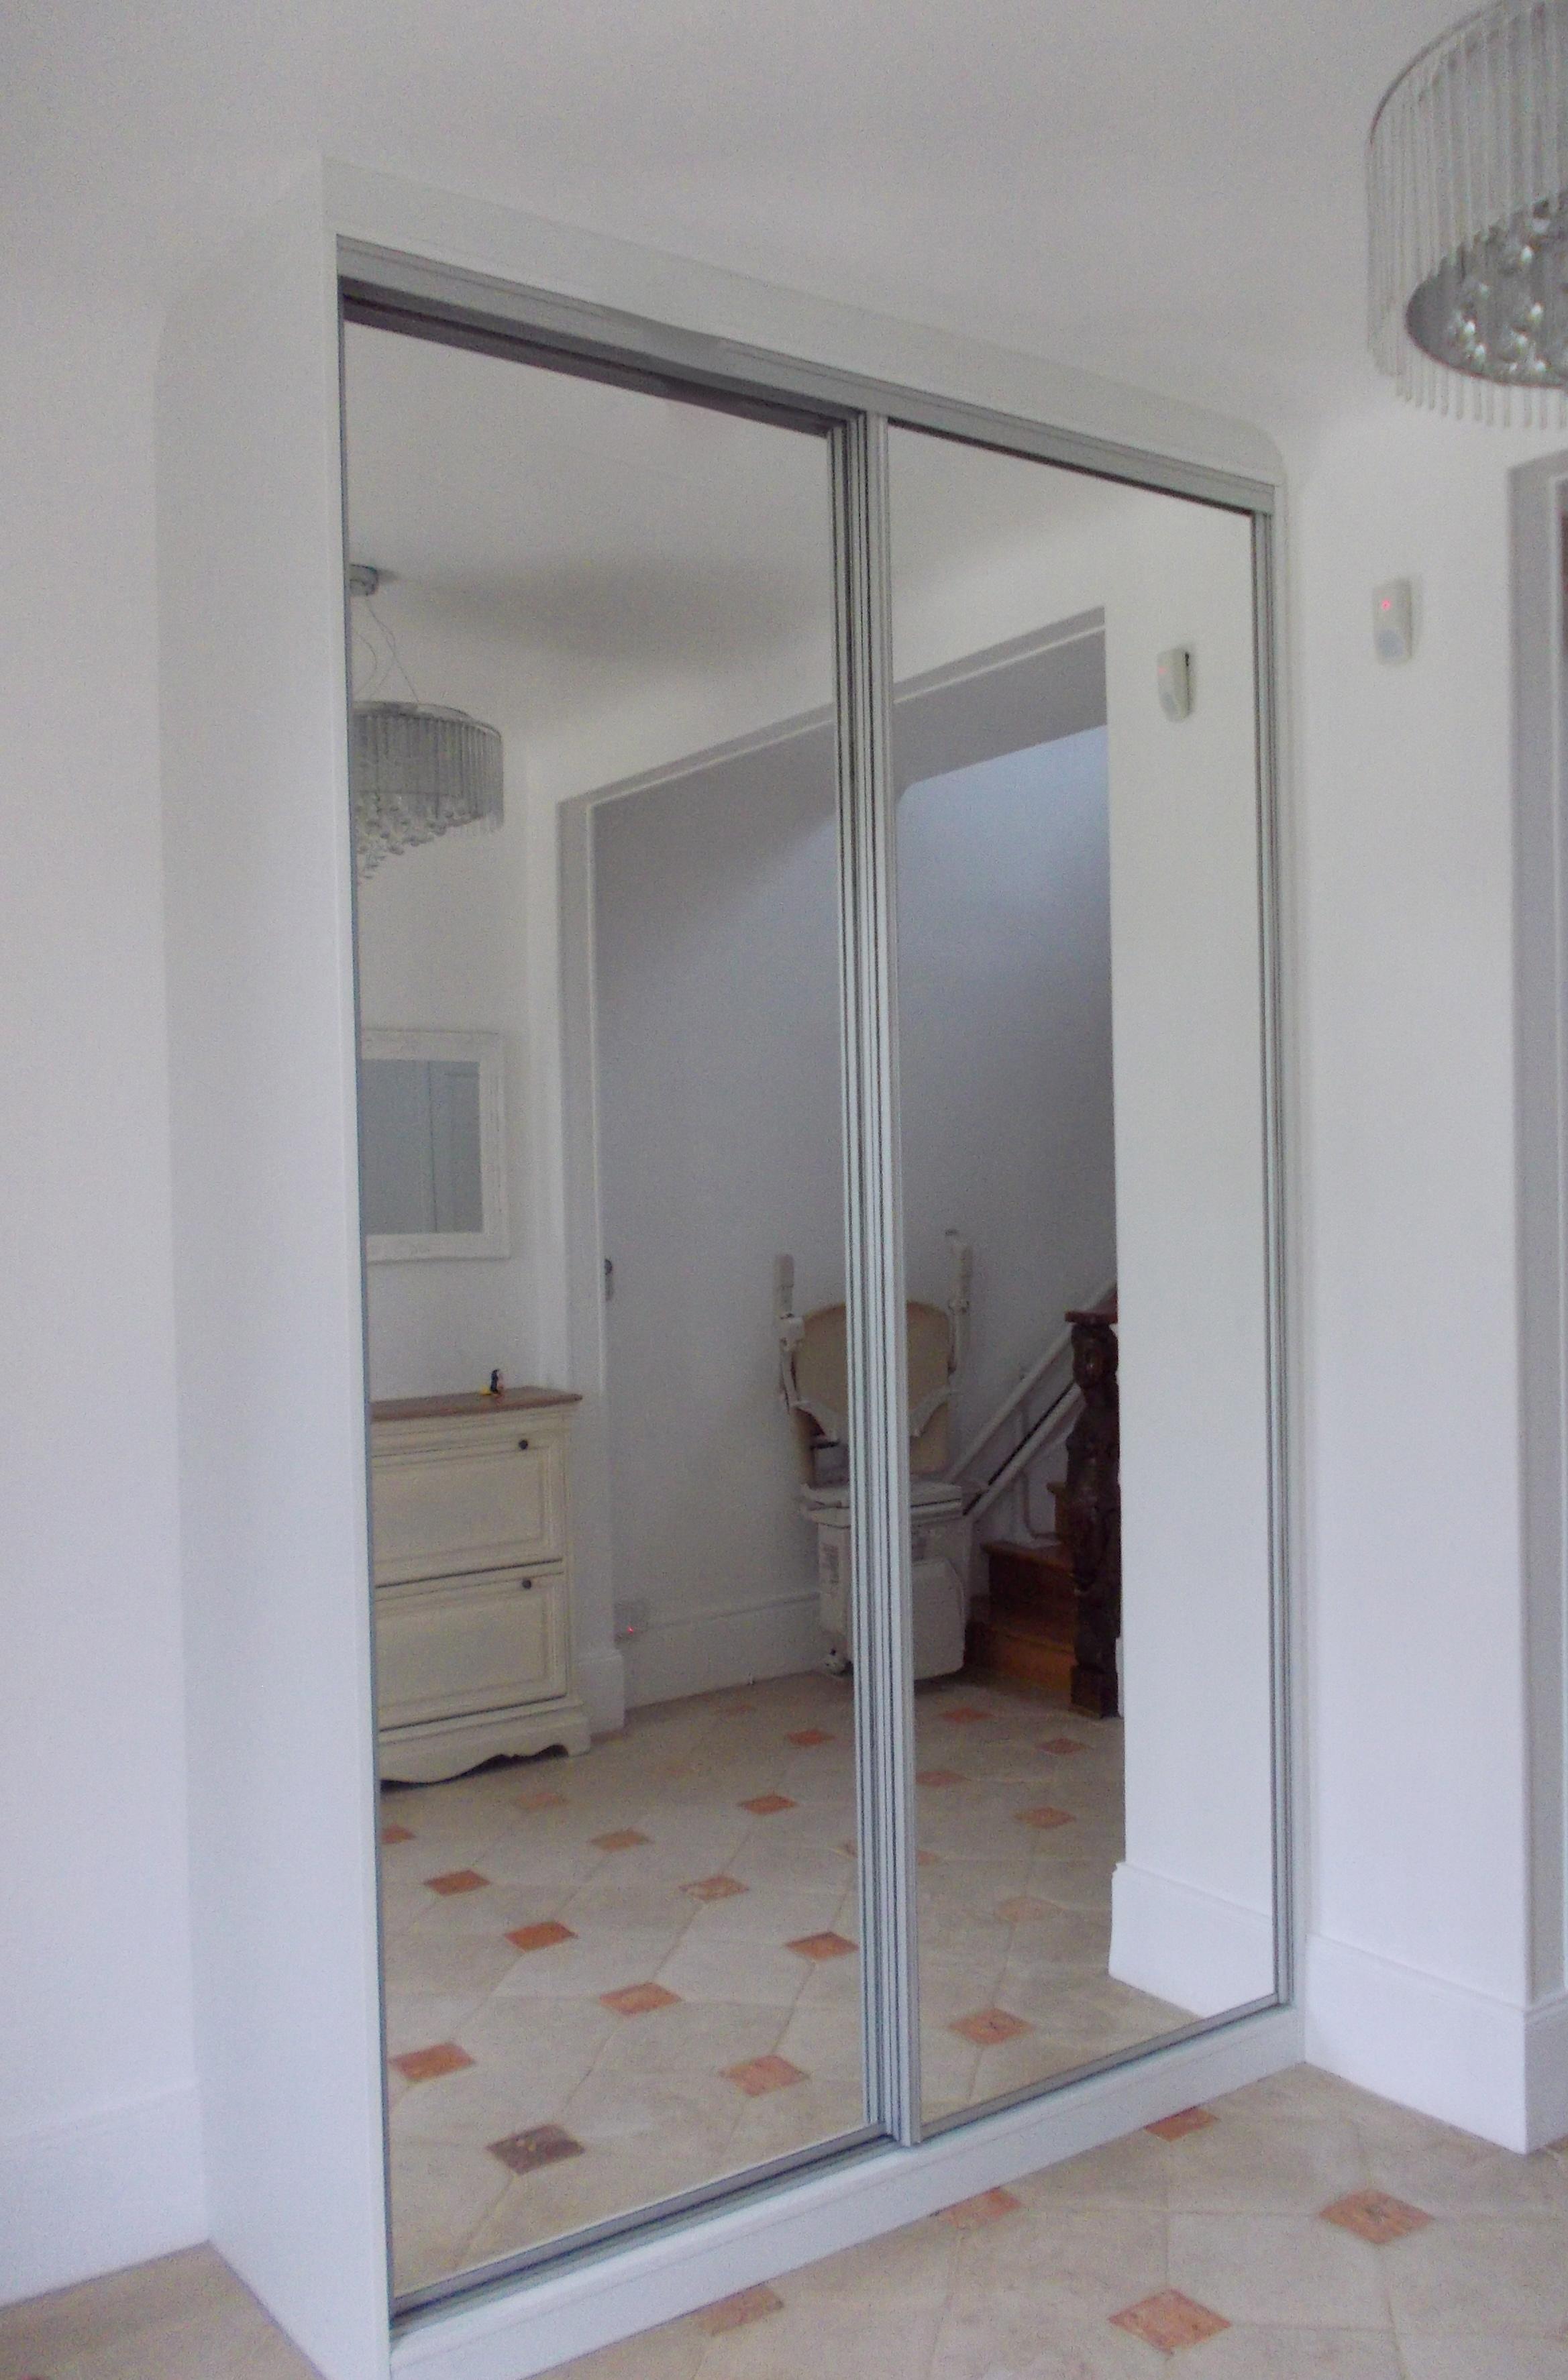 magasin sainte genevi ve des bois la maison du placard. Black Bedroom Furniture Sets. Home Design Ideas